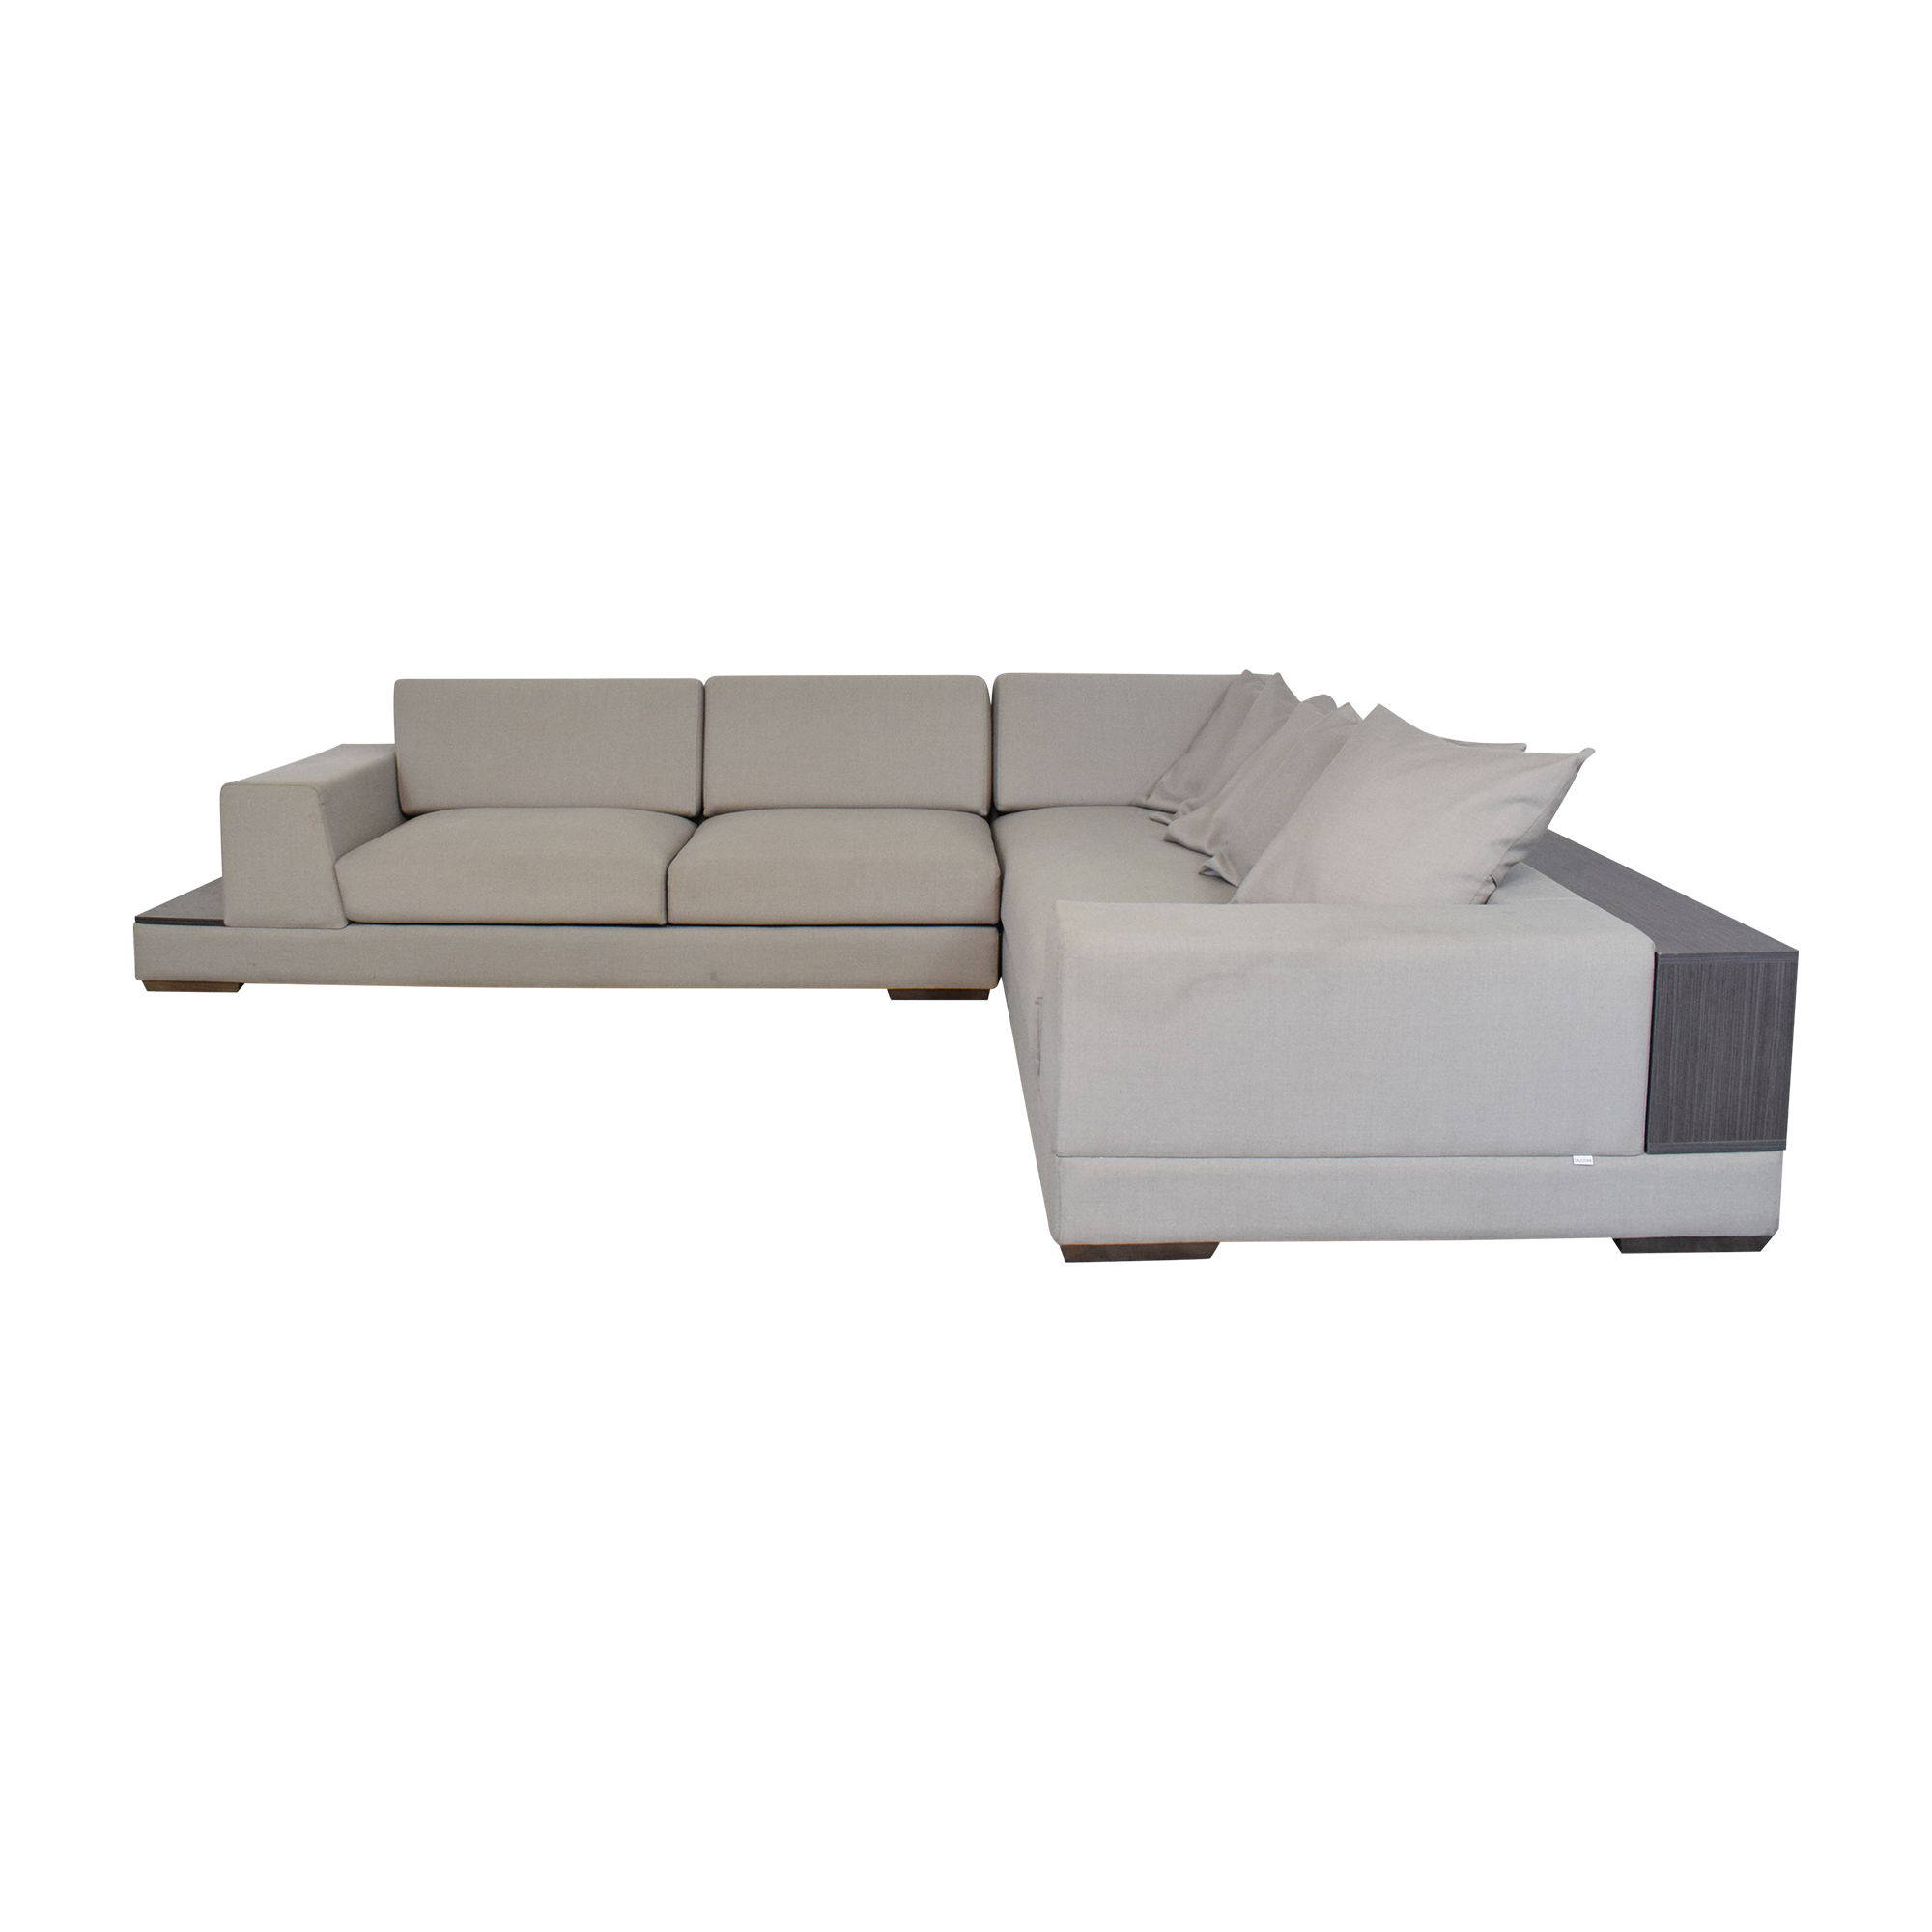 Lazzoni Lazzoni Bikom Modular Sectional Sofa price